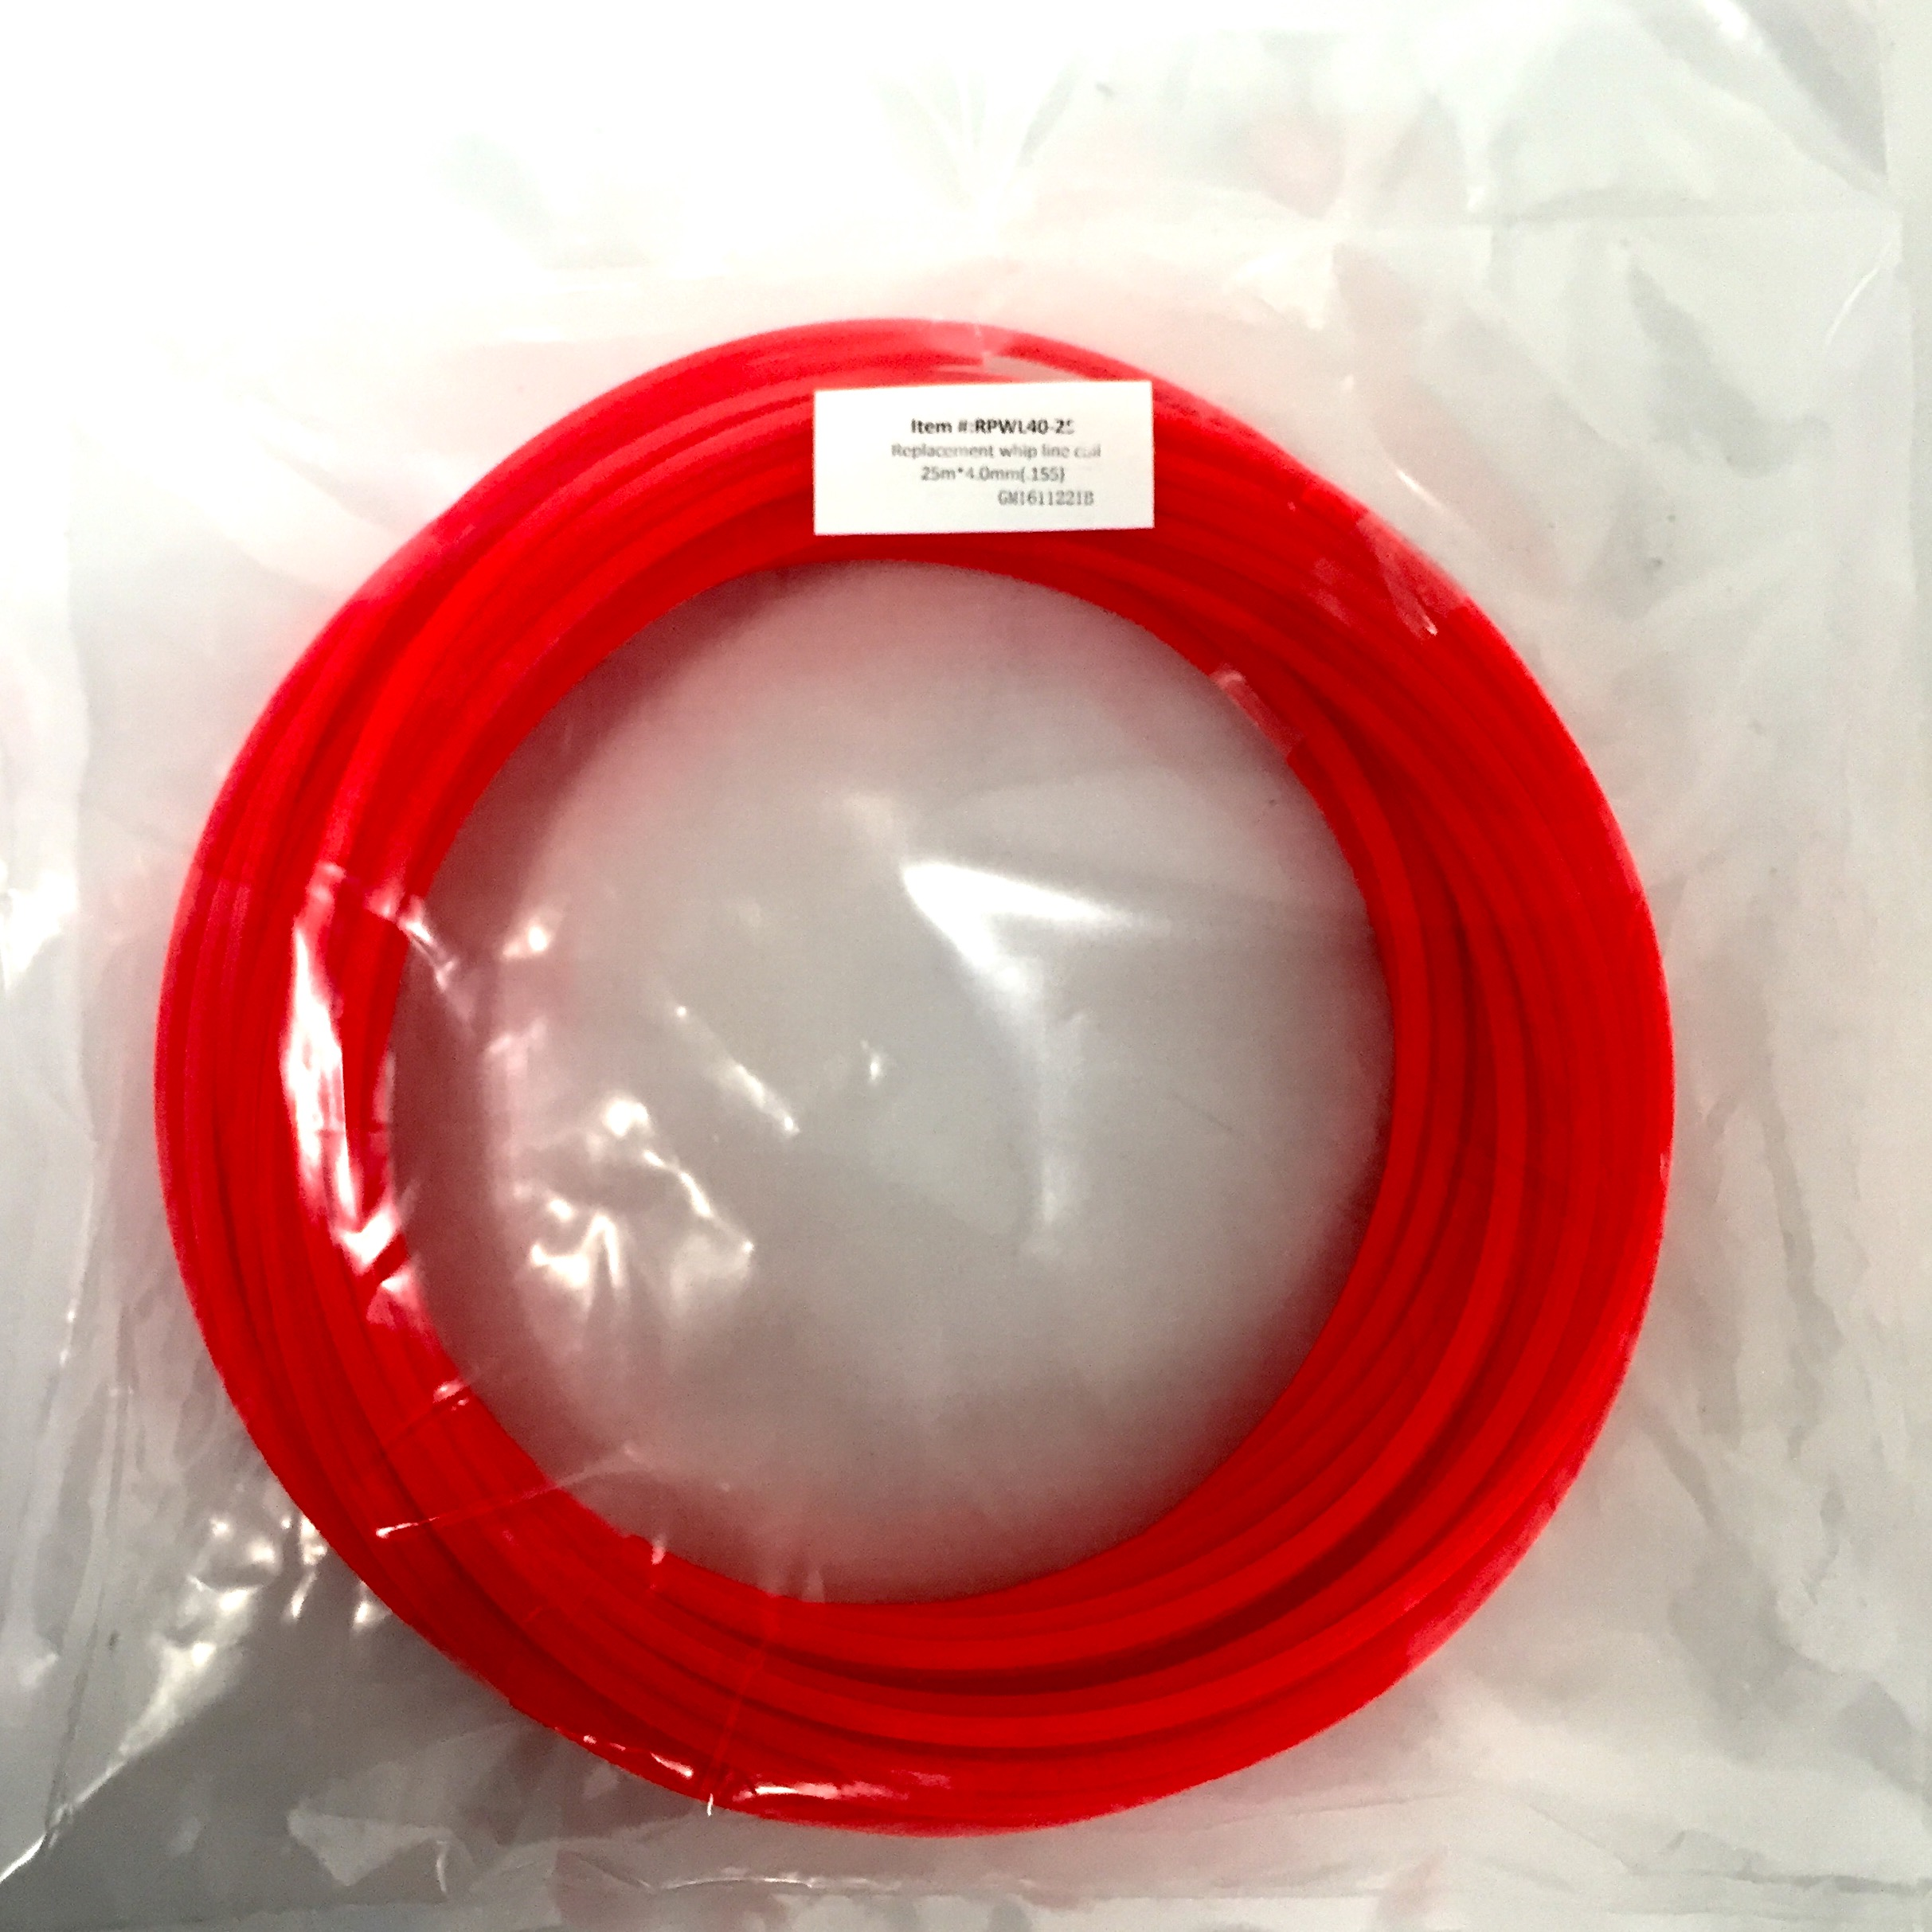 Snaplok 25M x 4mm Co-polymer Whip Line Reel - Hex